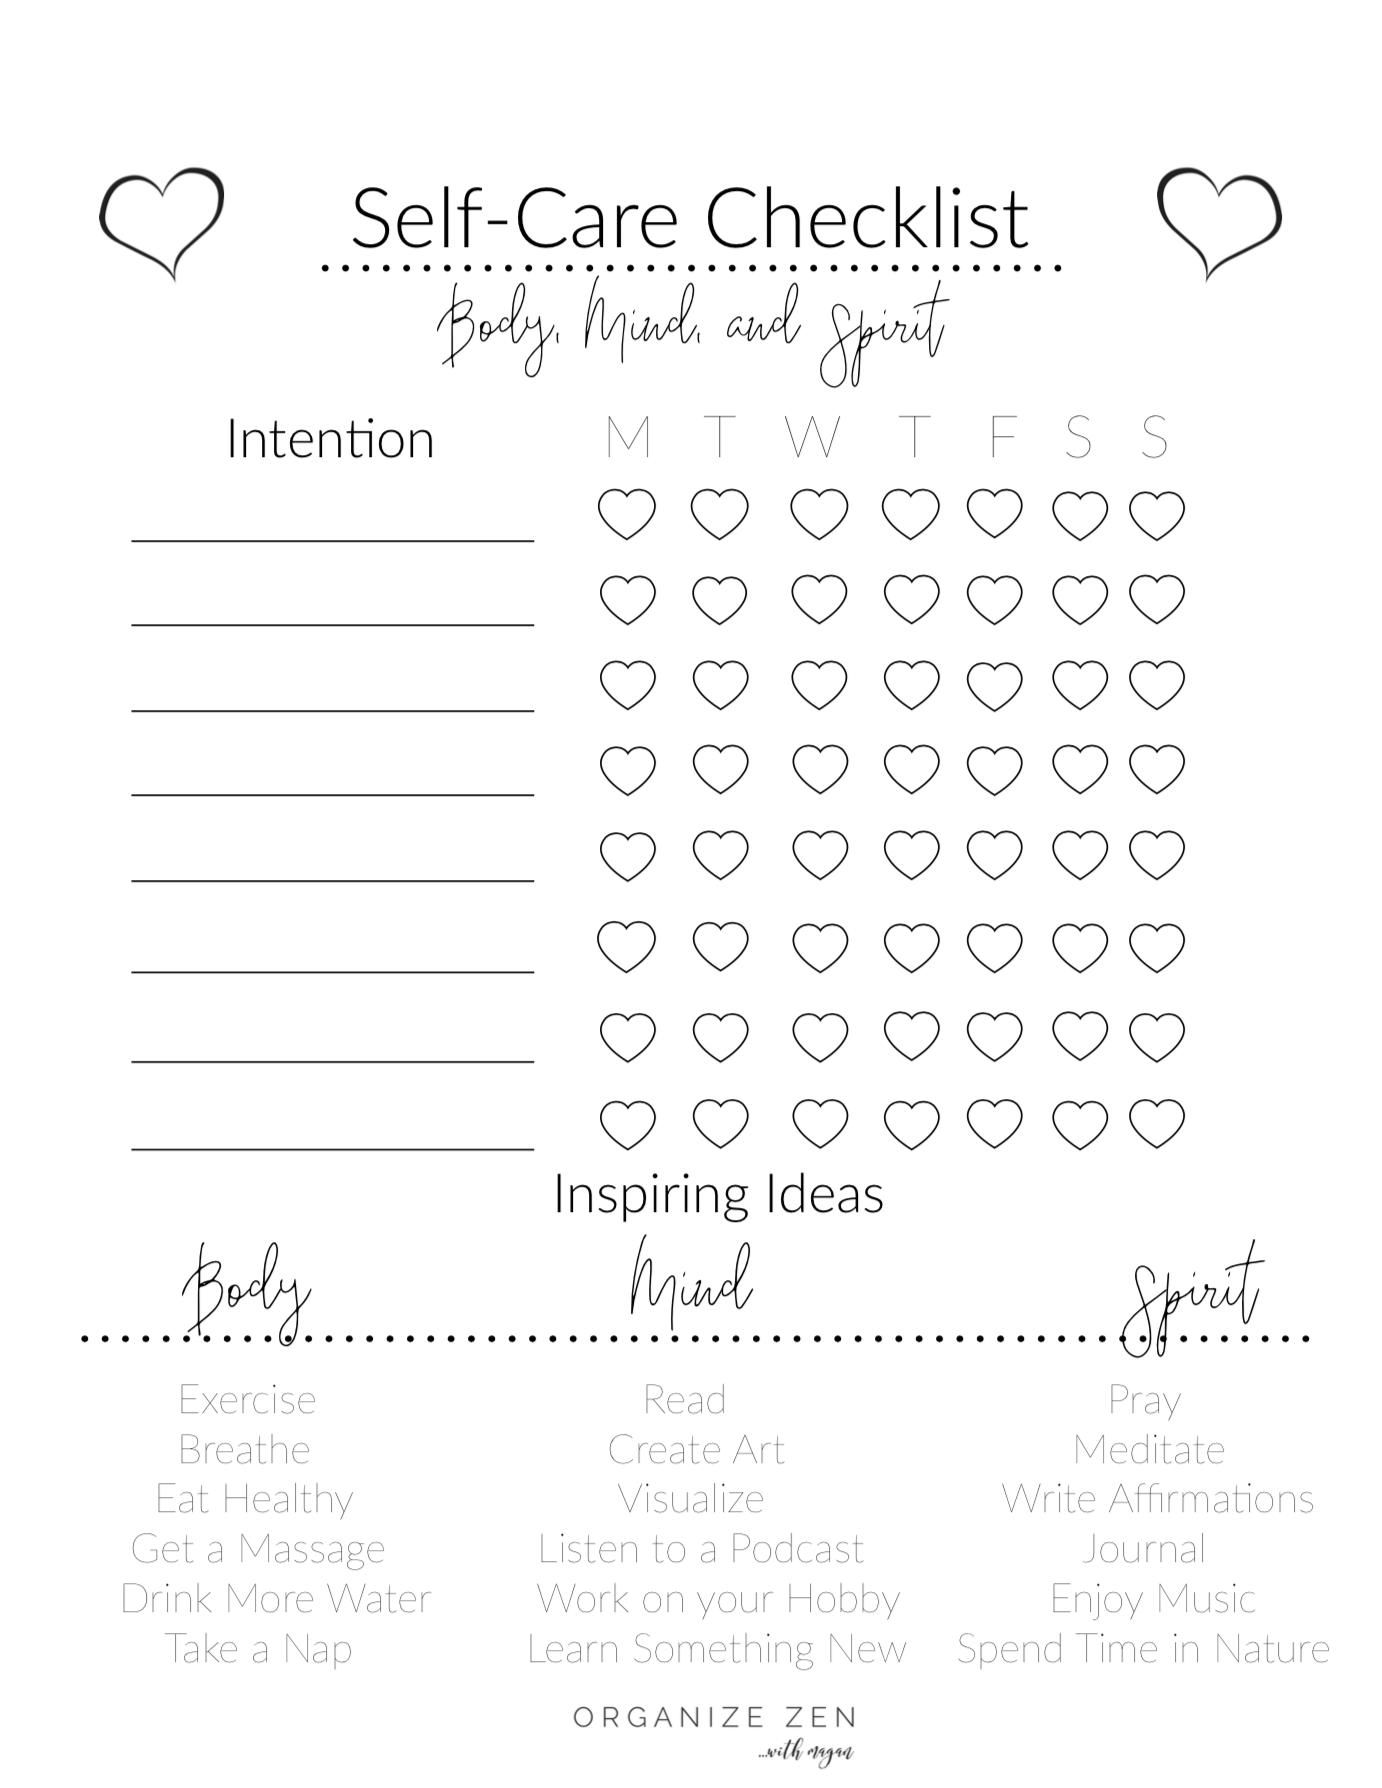 Self Care Checklist Free Printable Self Care Worksheets Self Care Bullet Journal Self Care